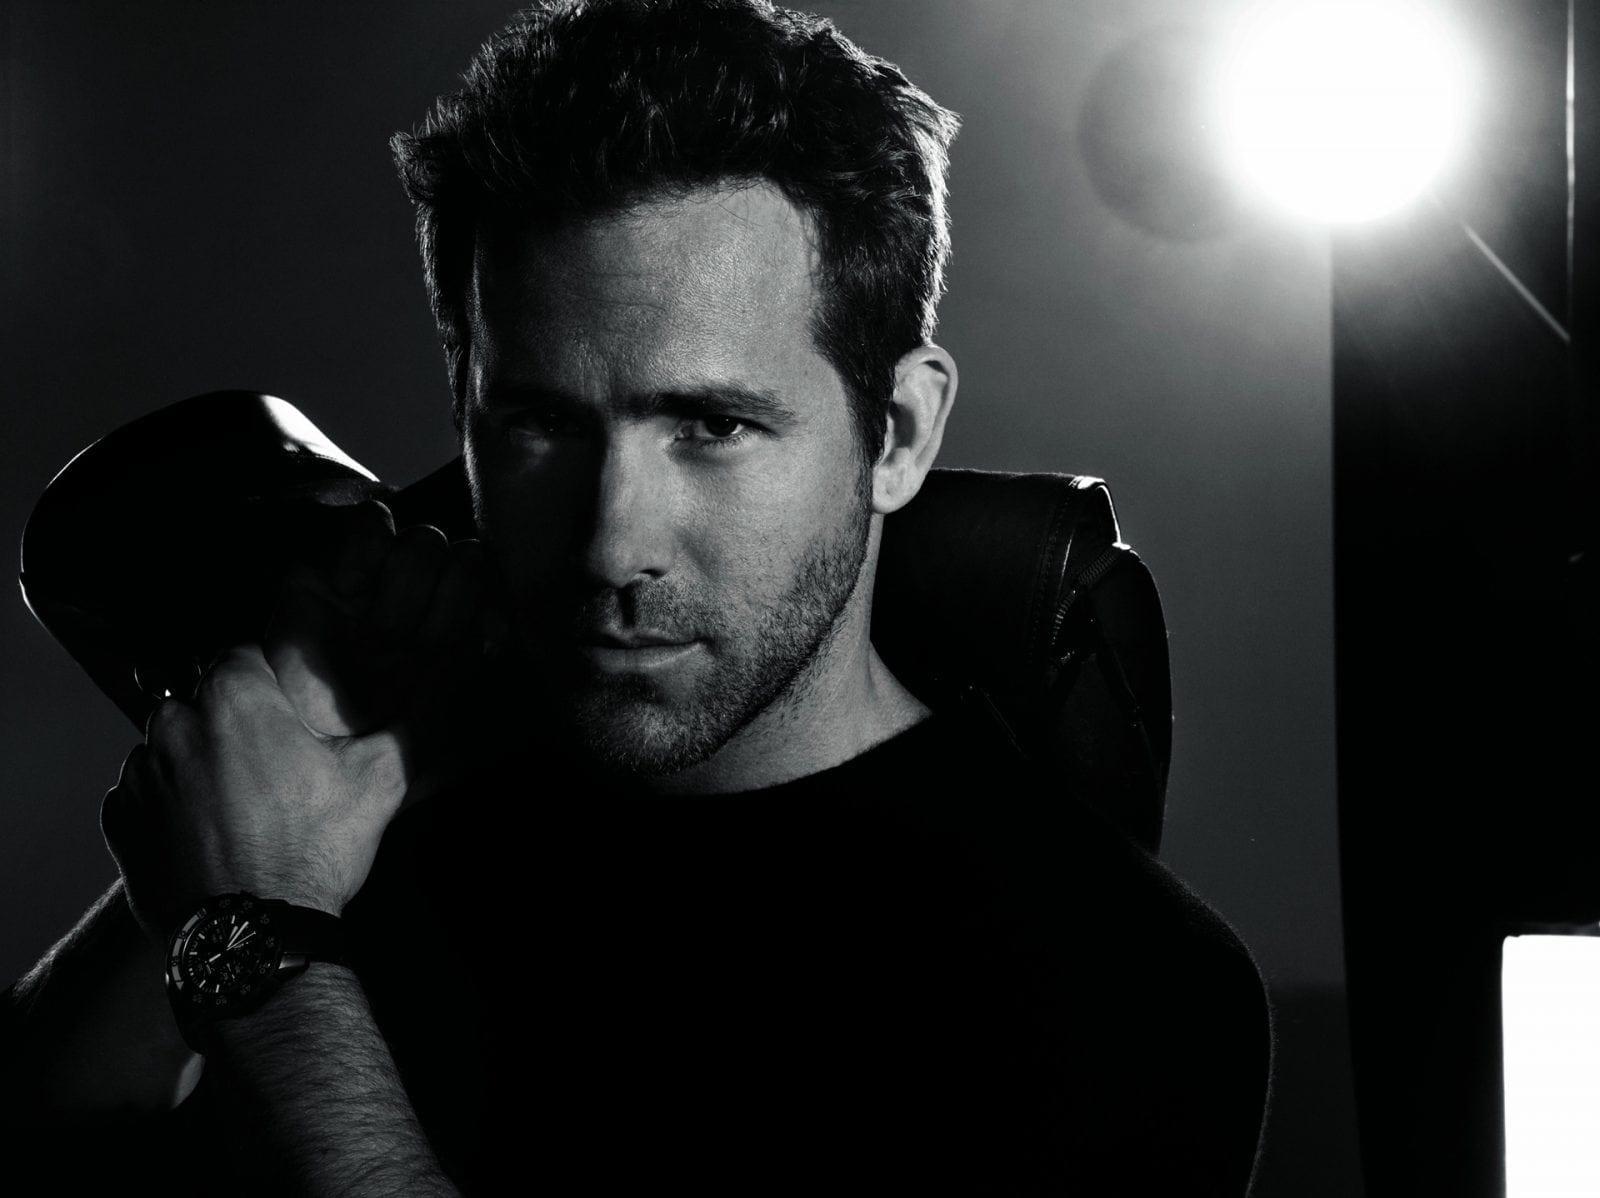 OFFICIAL PORTRAIT RYAN REYNOLDS 2 - Ryan Reynolds este noul ambasador Piaget